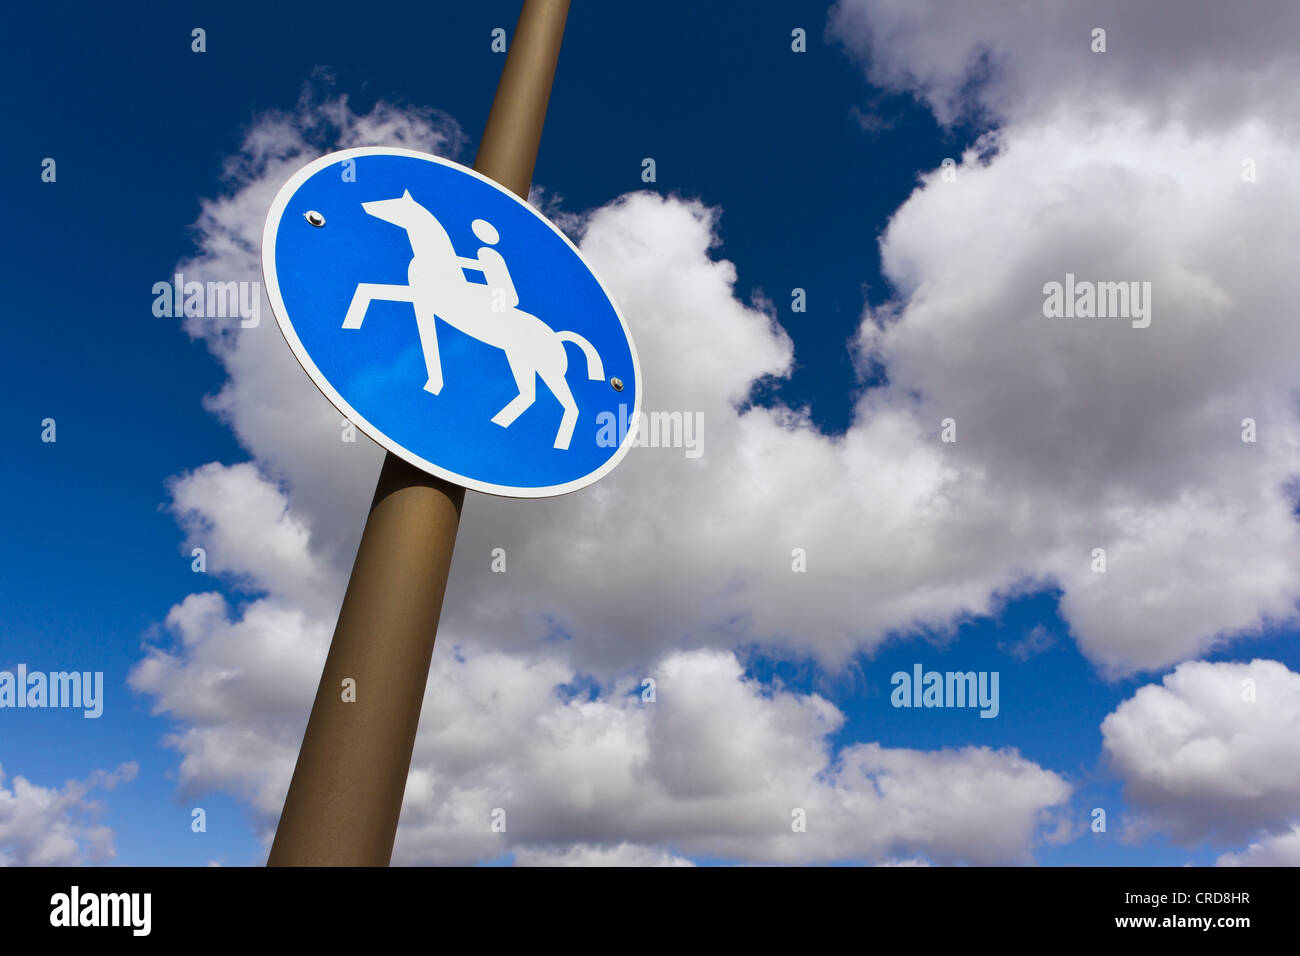 Sign 'bridleway', Sylt, Schleswig-Holstein, Germany, Europe - Stock Image